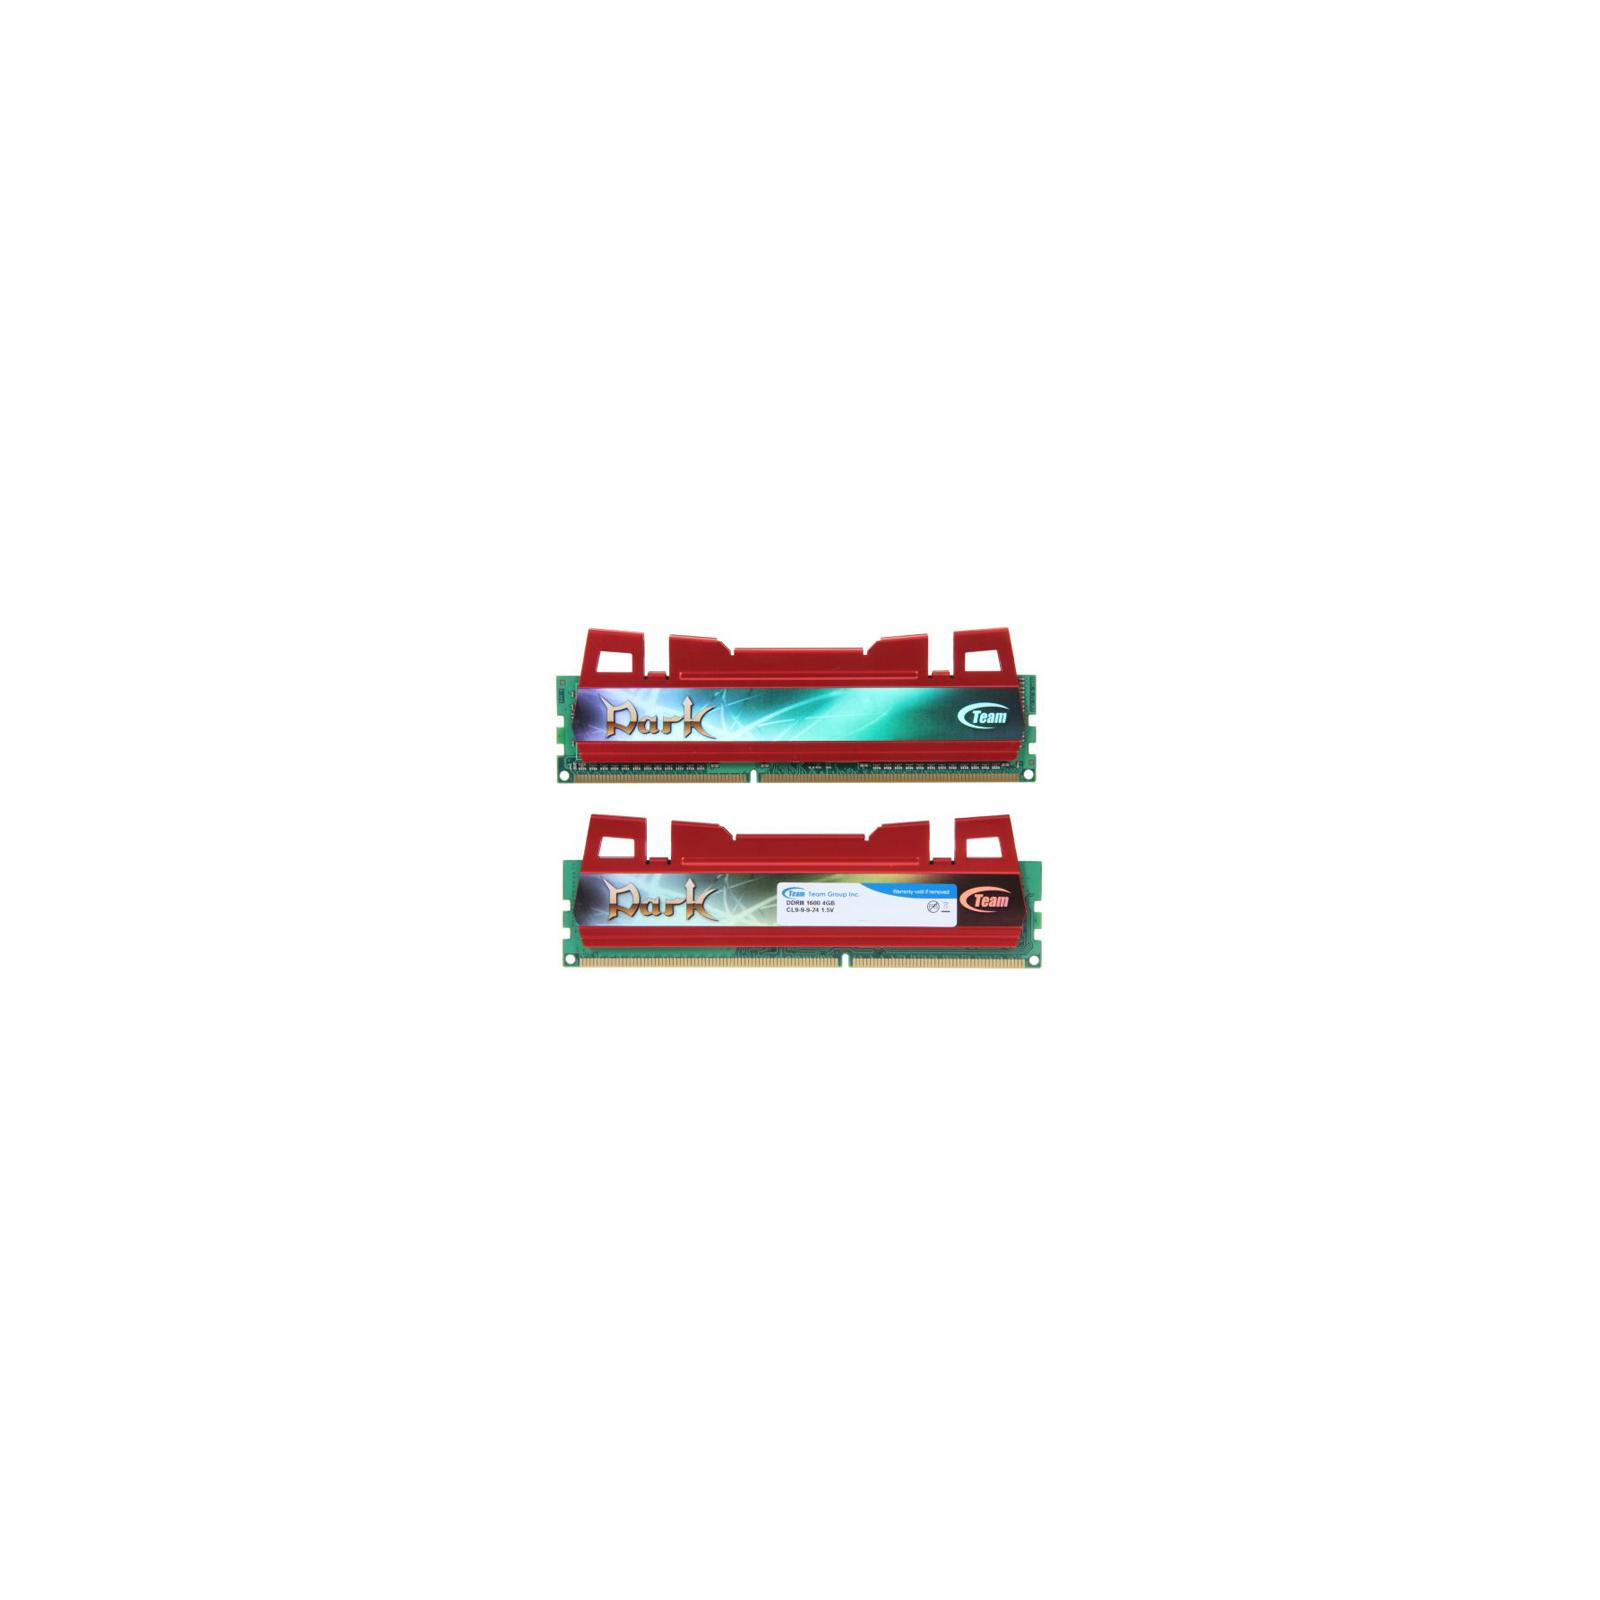 Модуль памяти для компьютера DDR3 8GB (2x4GB) 1600 MHz Team (TDRD38G1600HC9DC01)